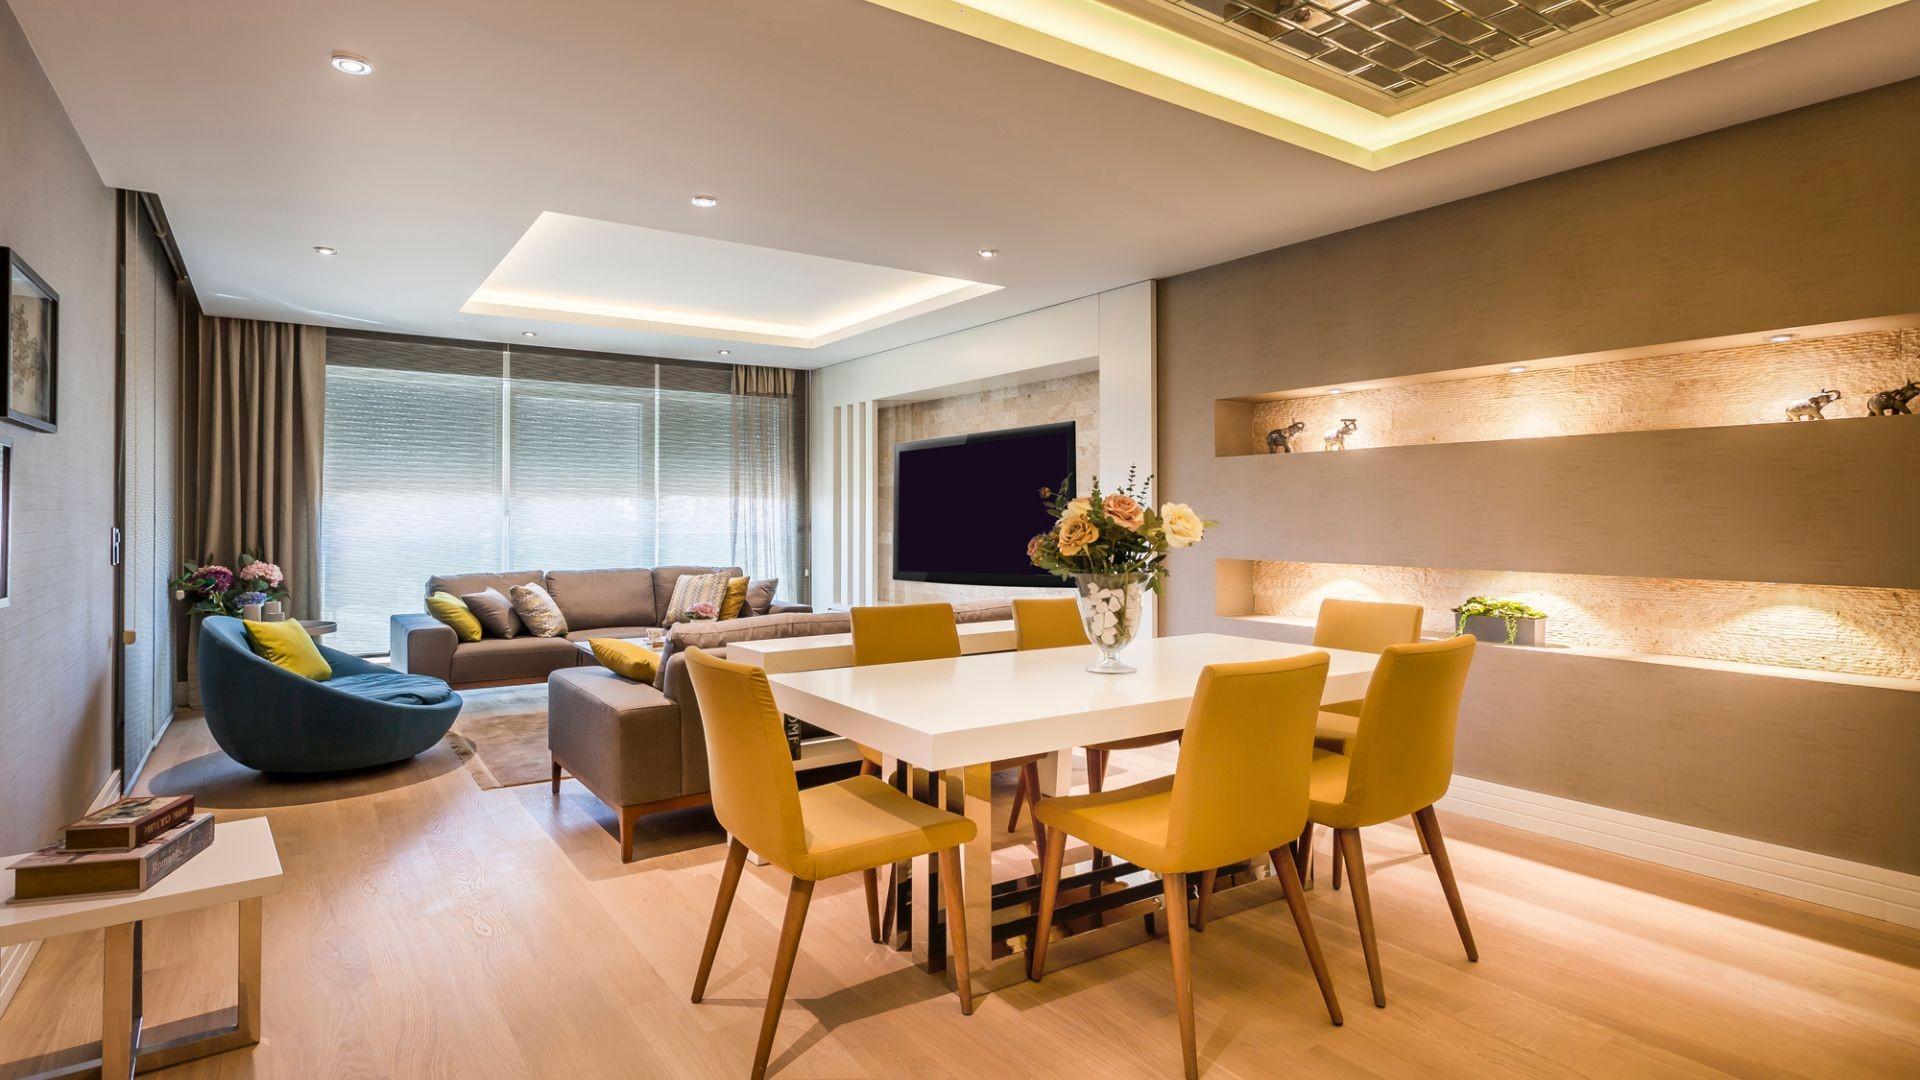 000 reformas integrales salon vivienda diseño decoracion  (4)